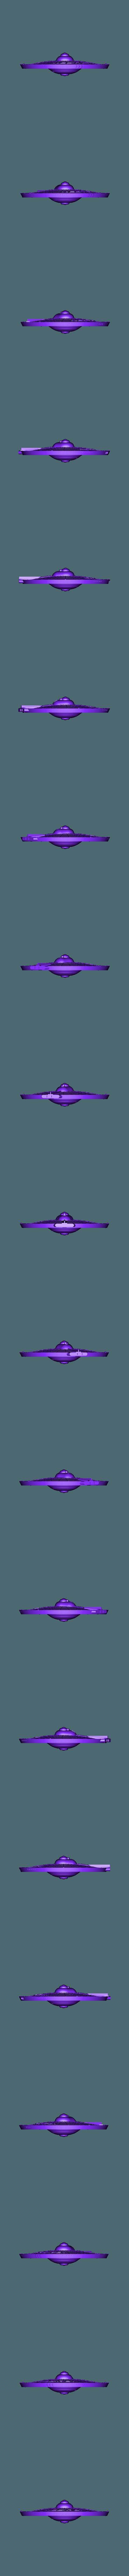 Primary Hull.stl Download free STL file Star Trek USS Enterprise NCC 1701 • 3D printing object, Dsk